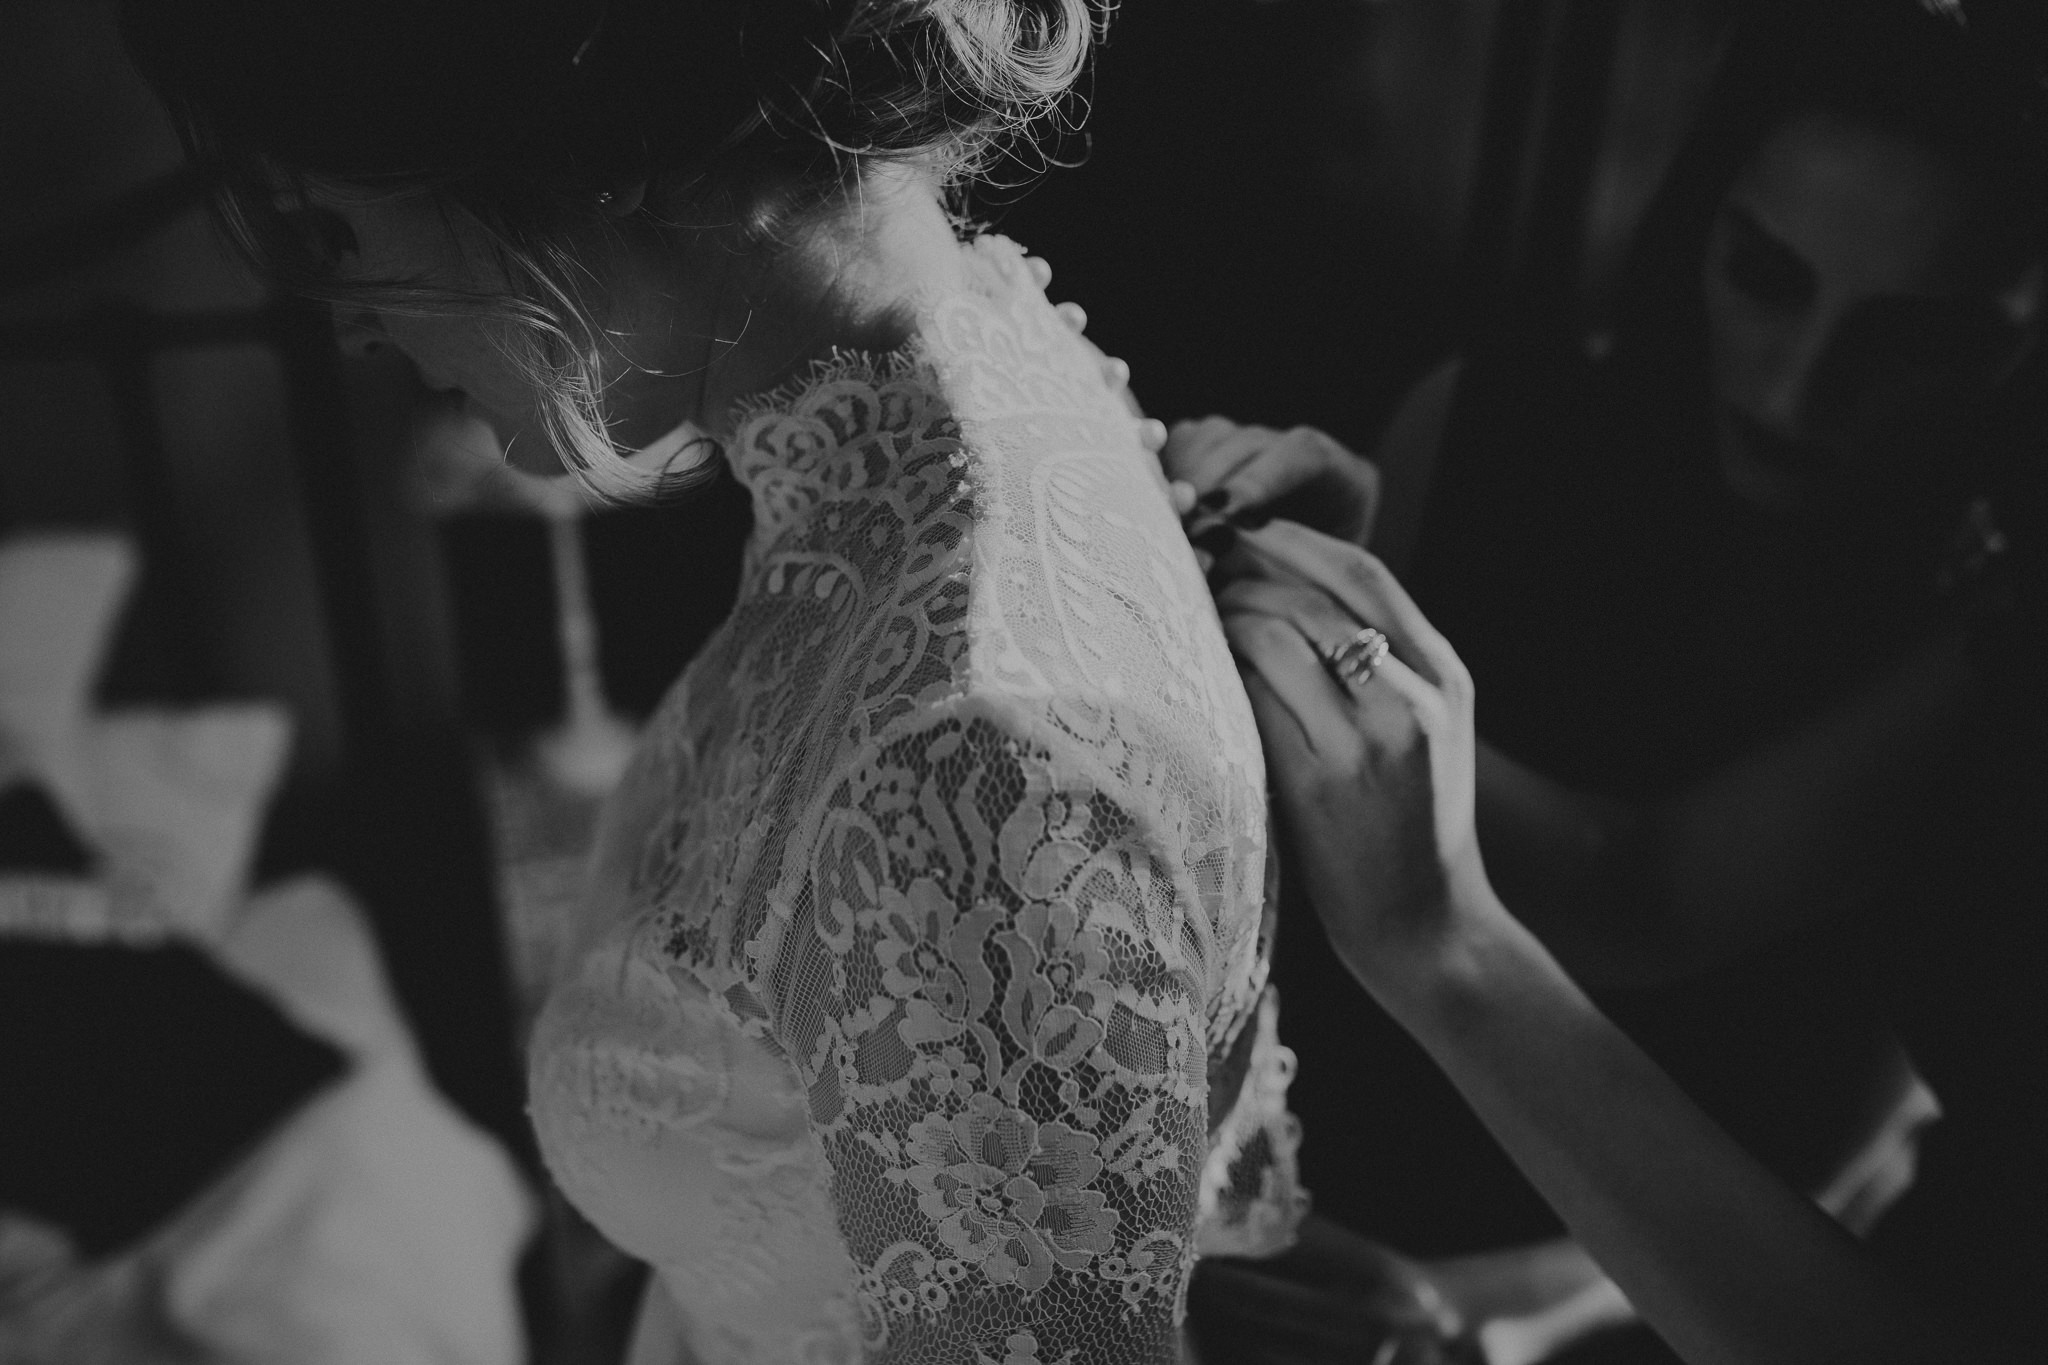 hampstead_wedding_photography_kate_gray-5.jpg